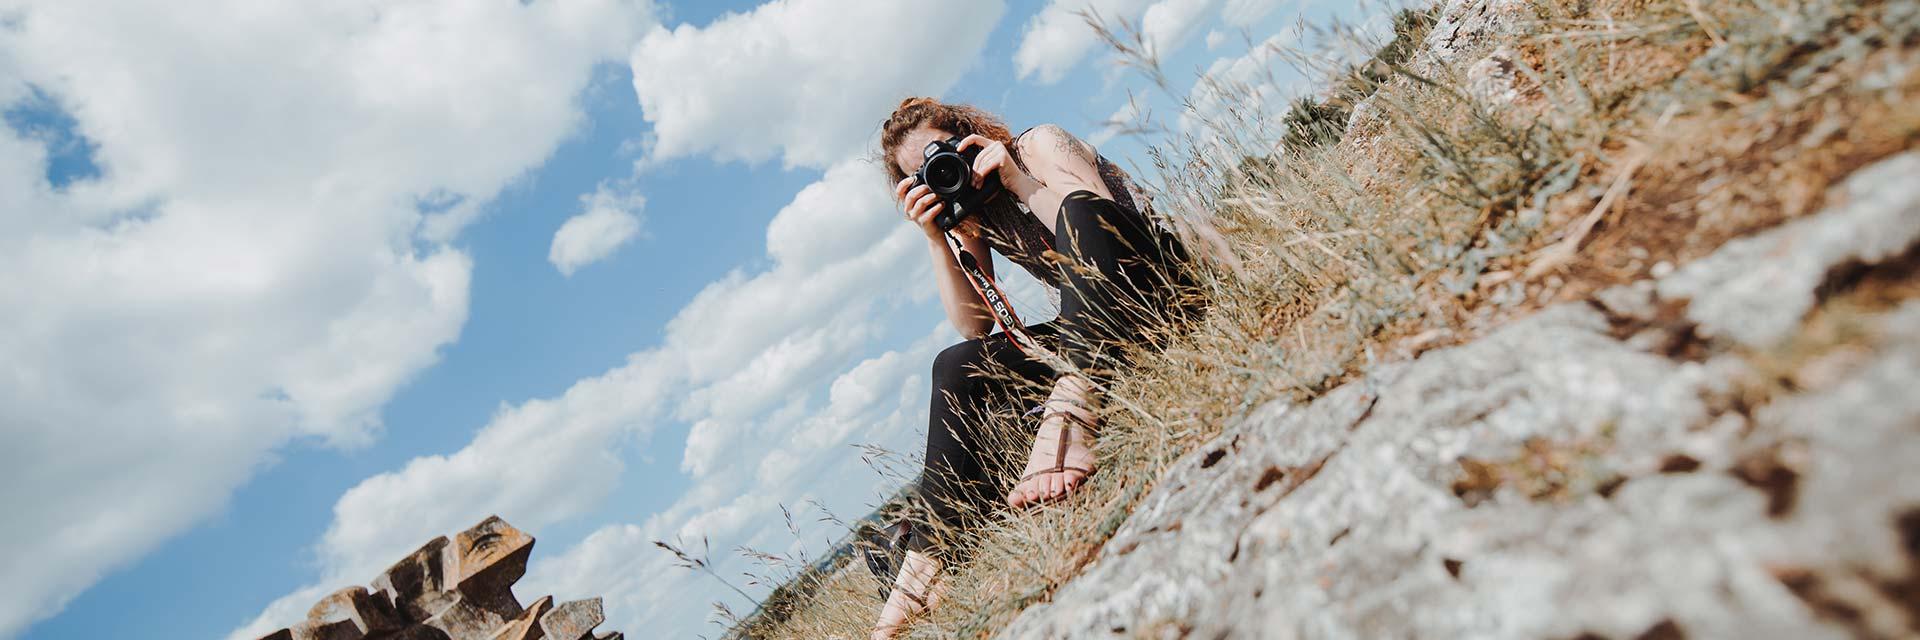 Fotograf Dresden Fotografie Dresden Professioneller Fotograf Individuelle Fotos Fotos Preise Outdoor Shooting Fotos draußen